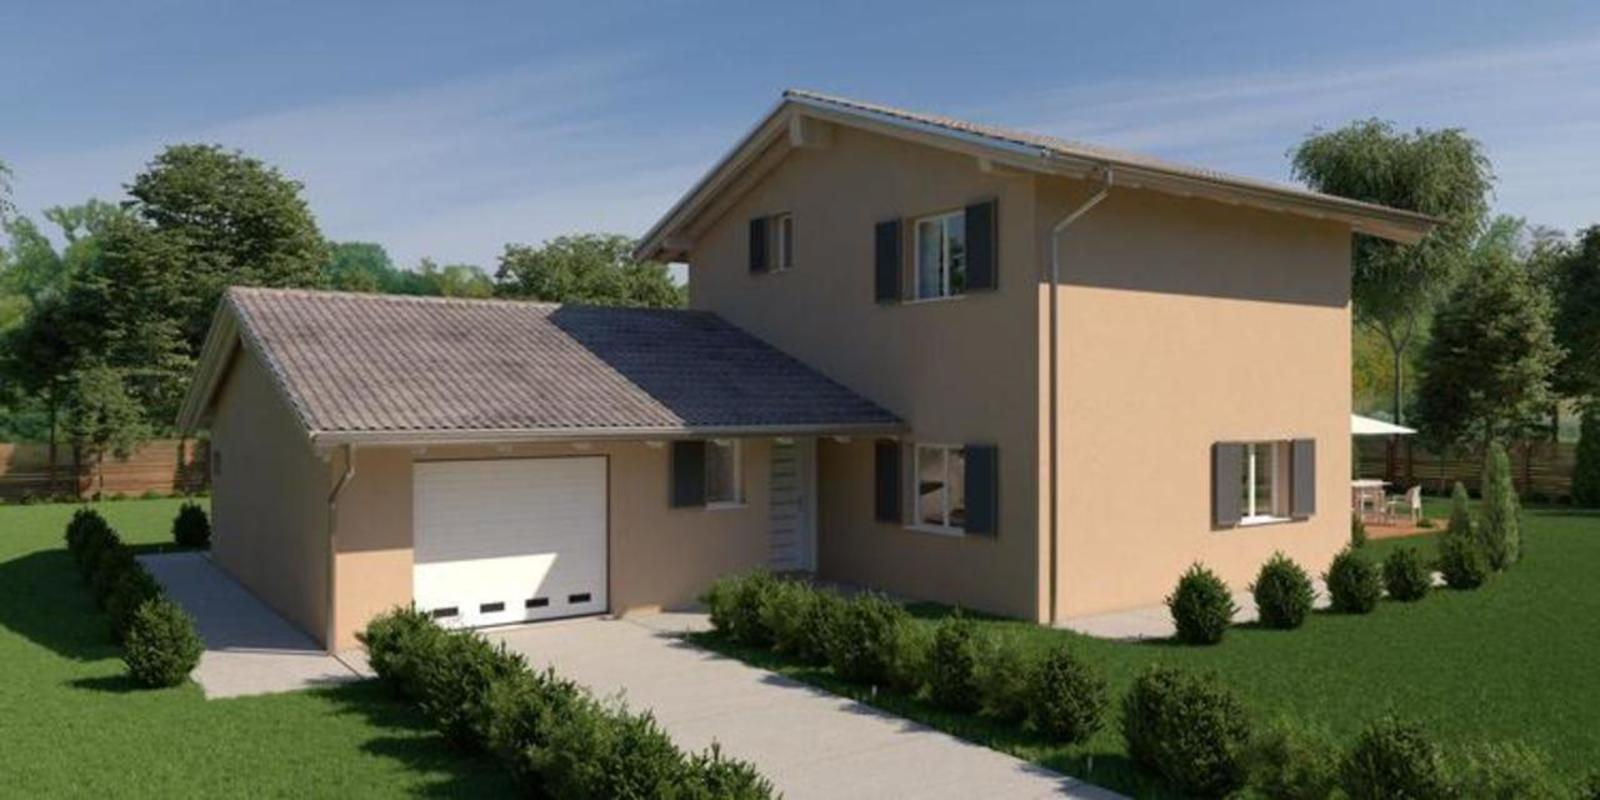 Gerofinance biens acheter appartement maison chalet for Appartement maison a acheter